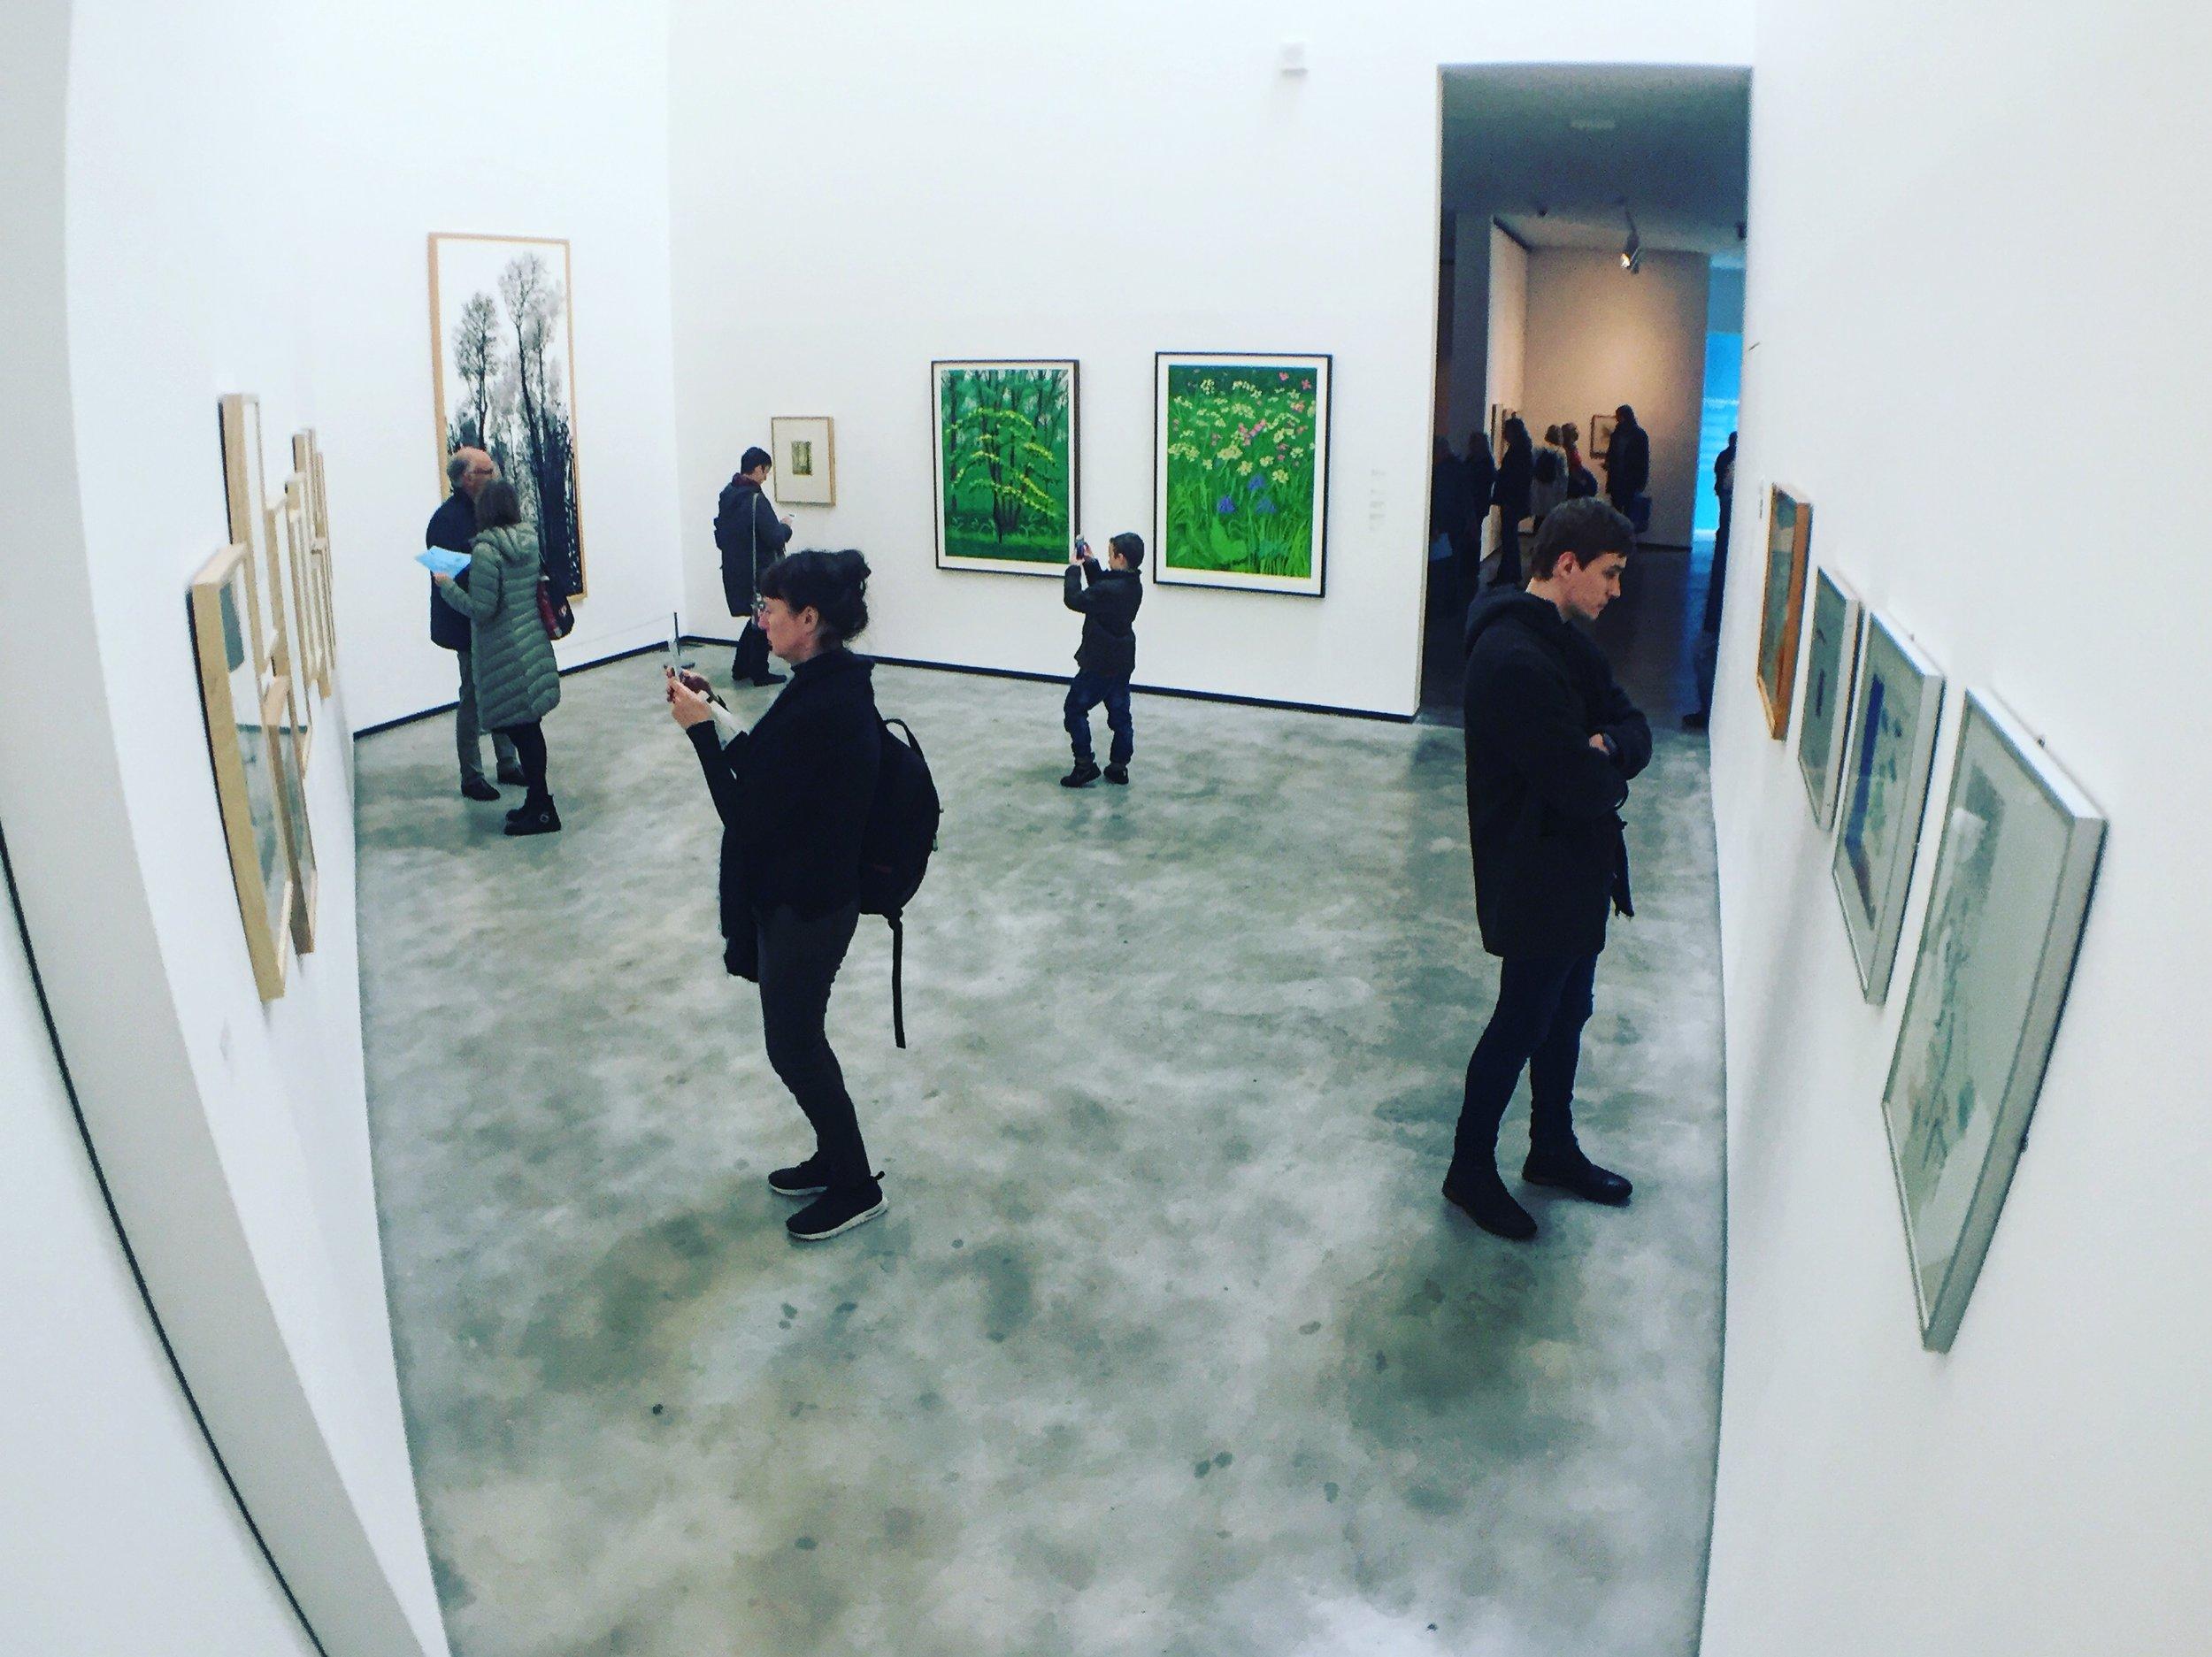 tall_gallery_the_mac_belfast_northern_ireland_ni_explorer_niexplorer